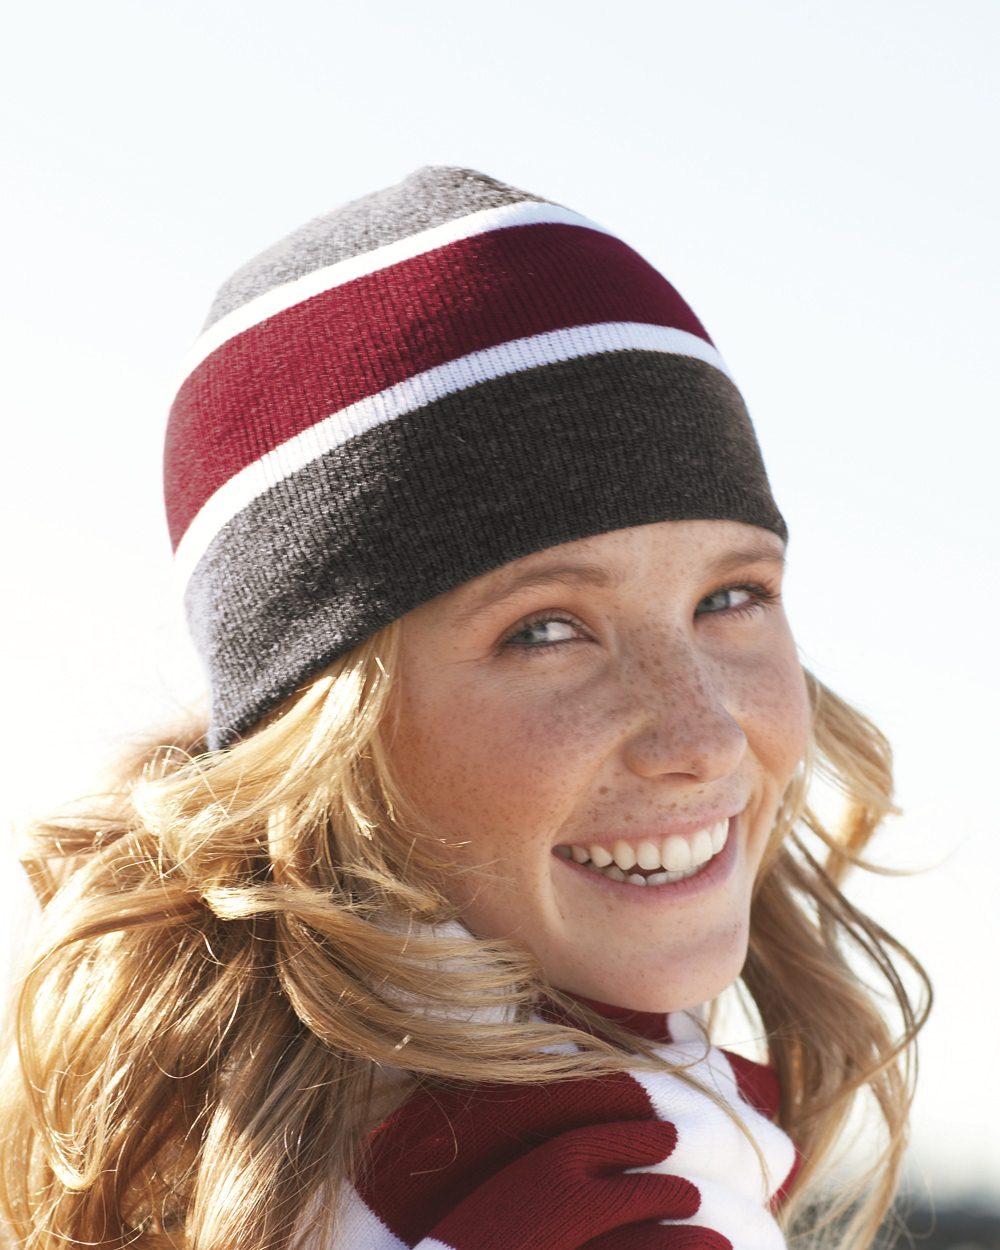 Sportsman Cap SP06 Striped Knit Beanie